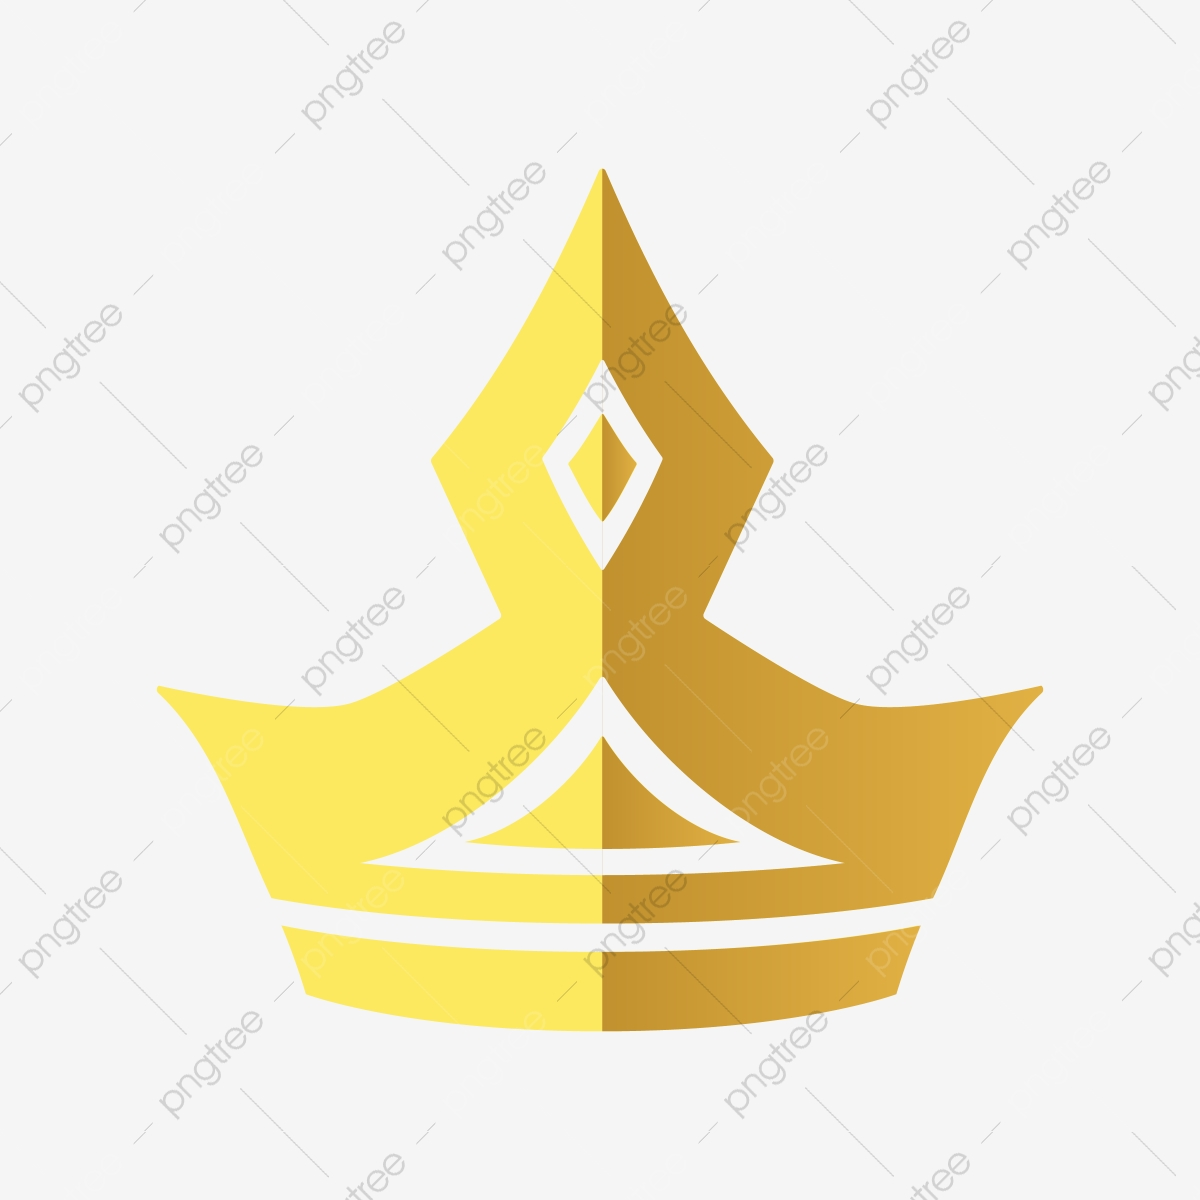 Elegante Goldene Krone Clipart Clipart Krone Elegante Png